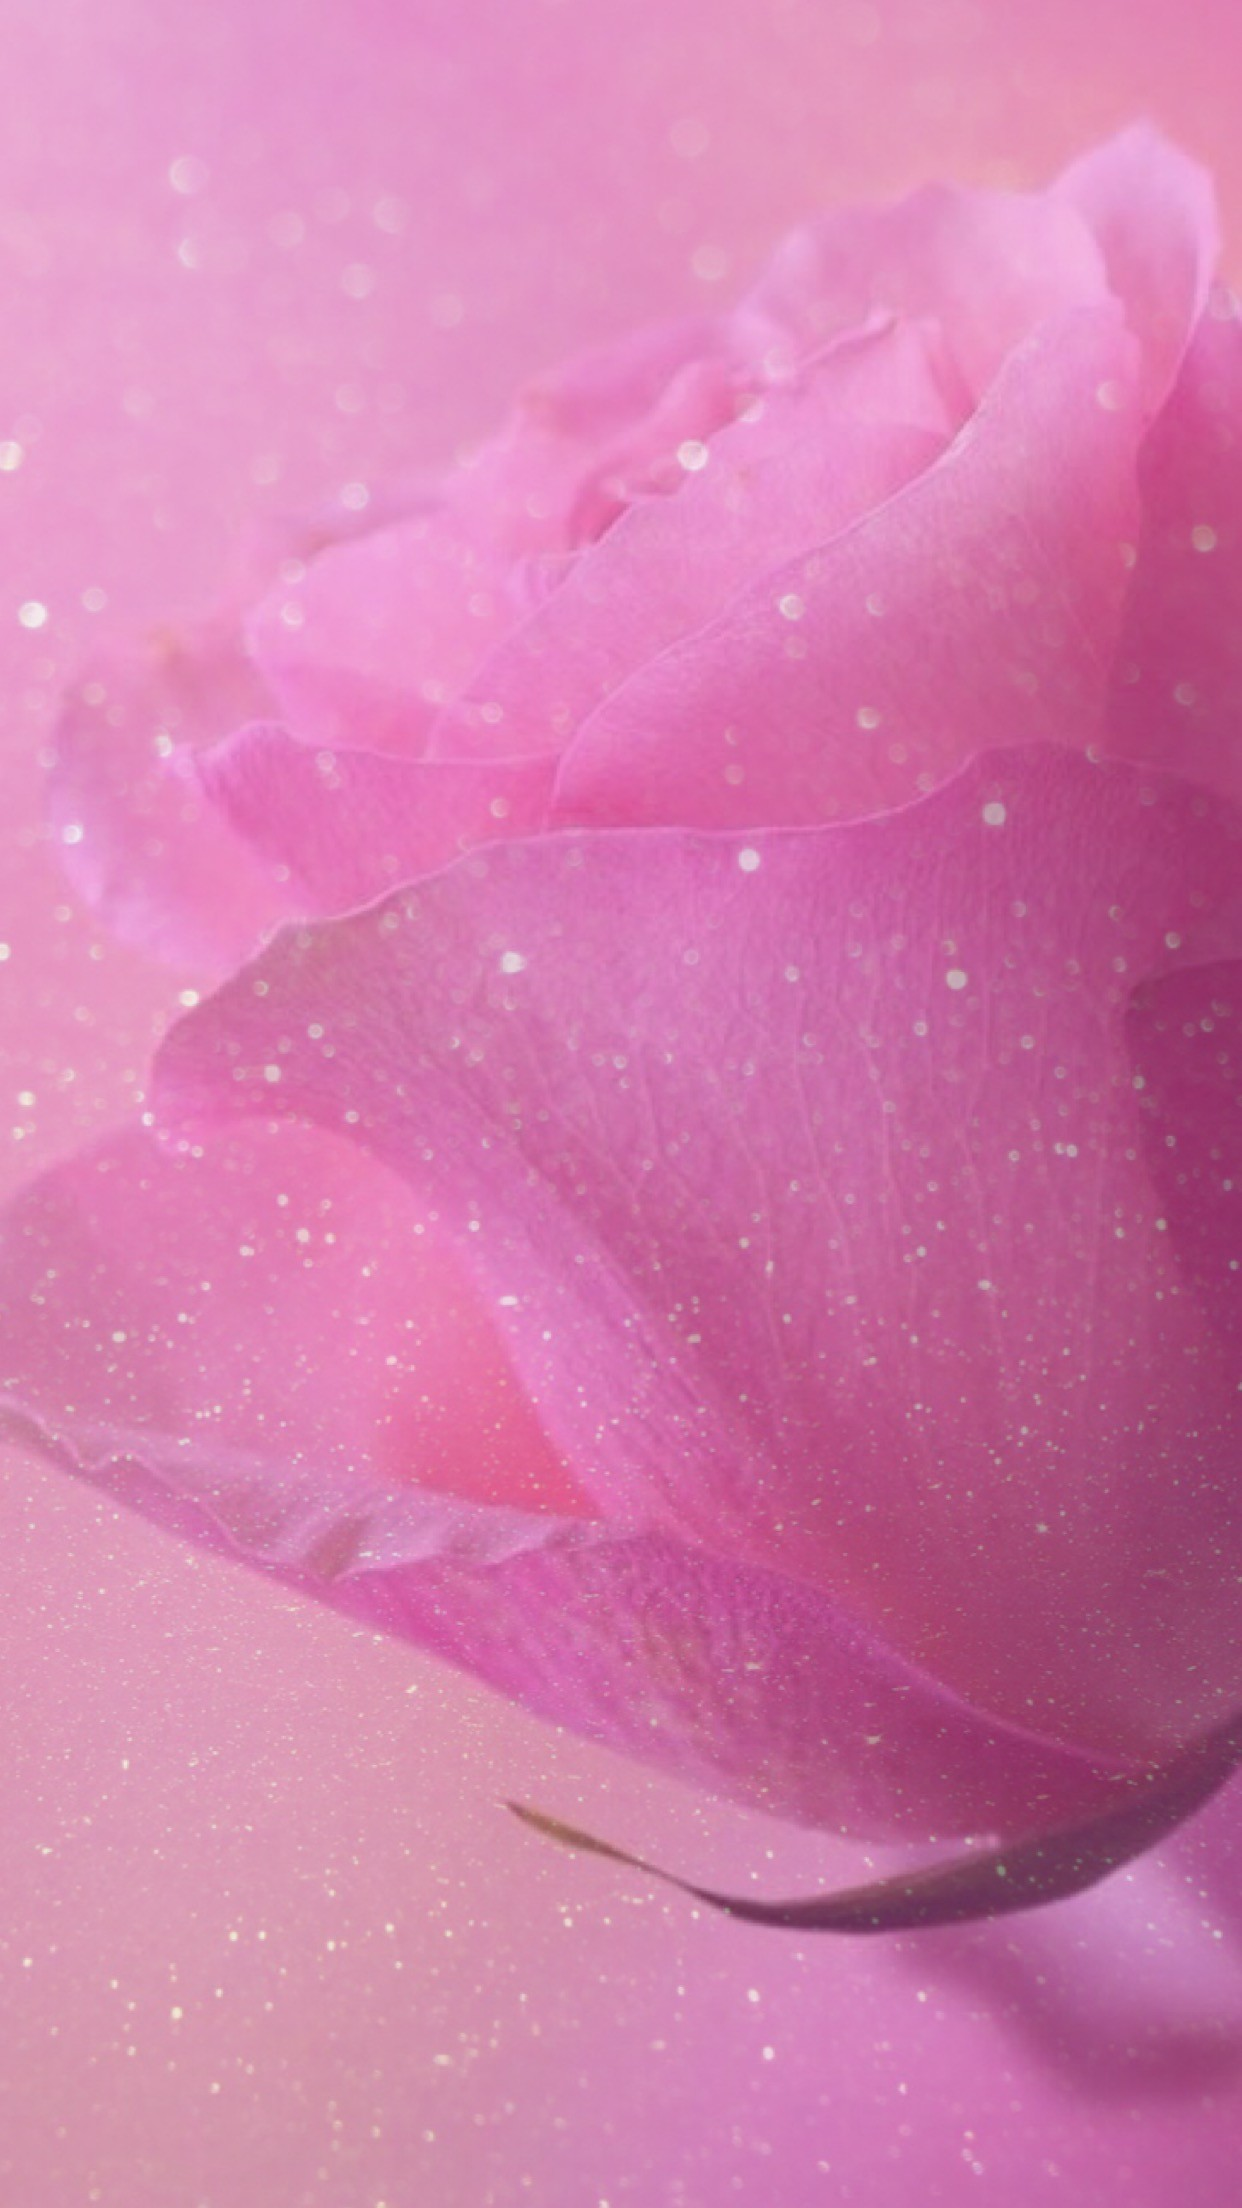 rose, sparkle, glitter, wallpaper, background, pink, pretty, girly,